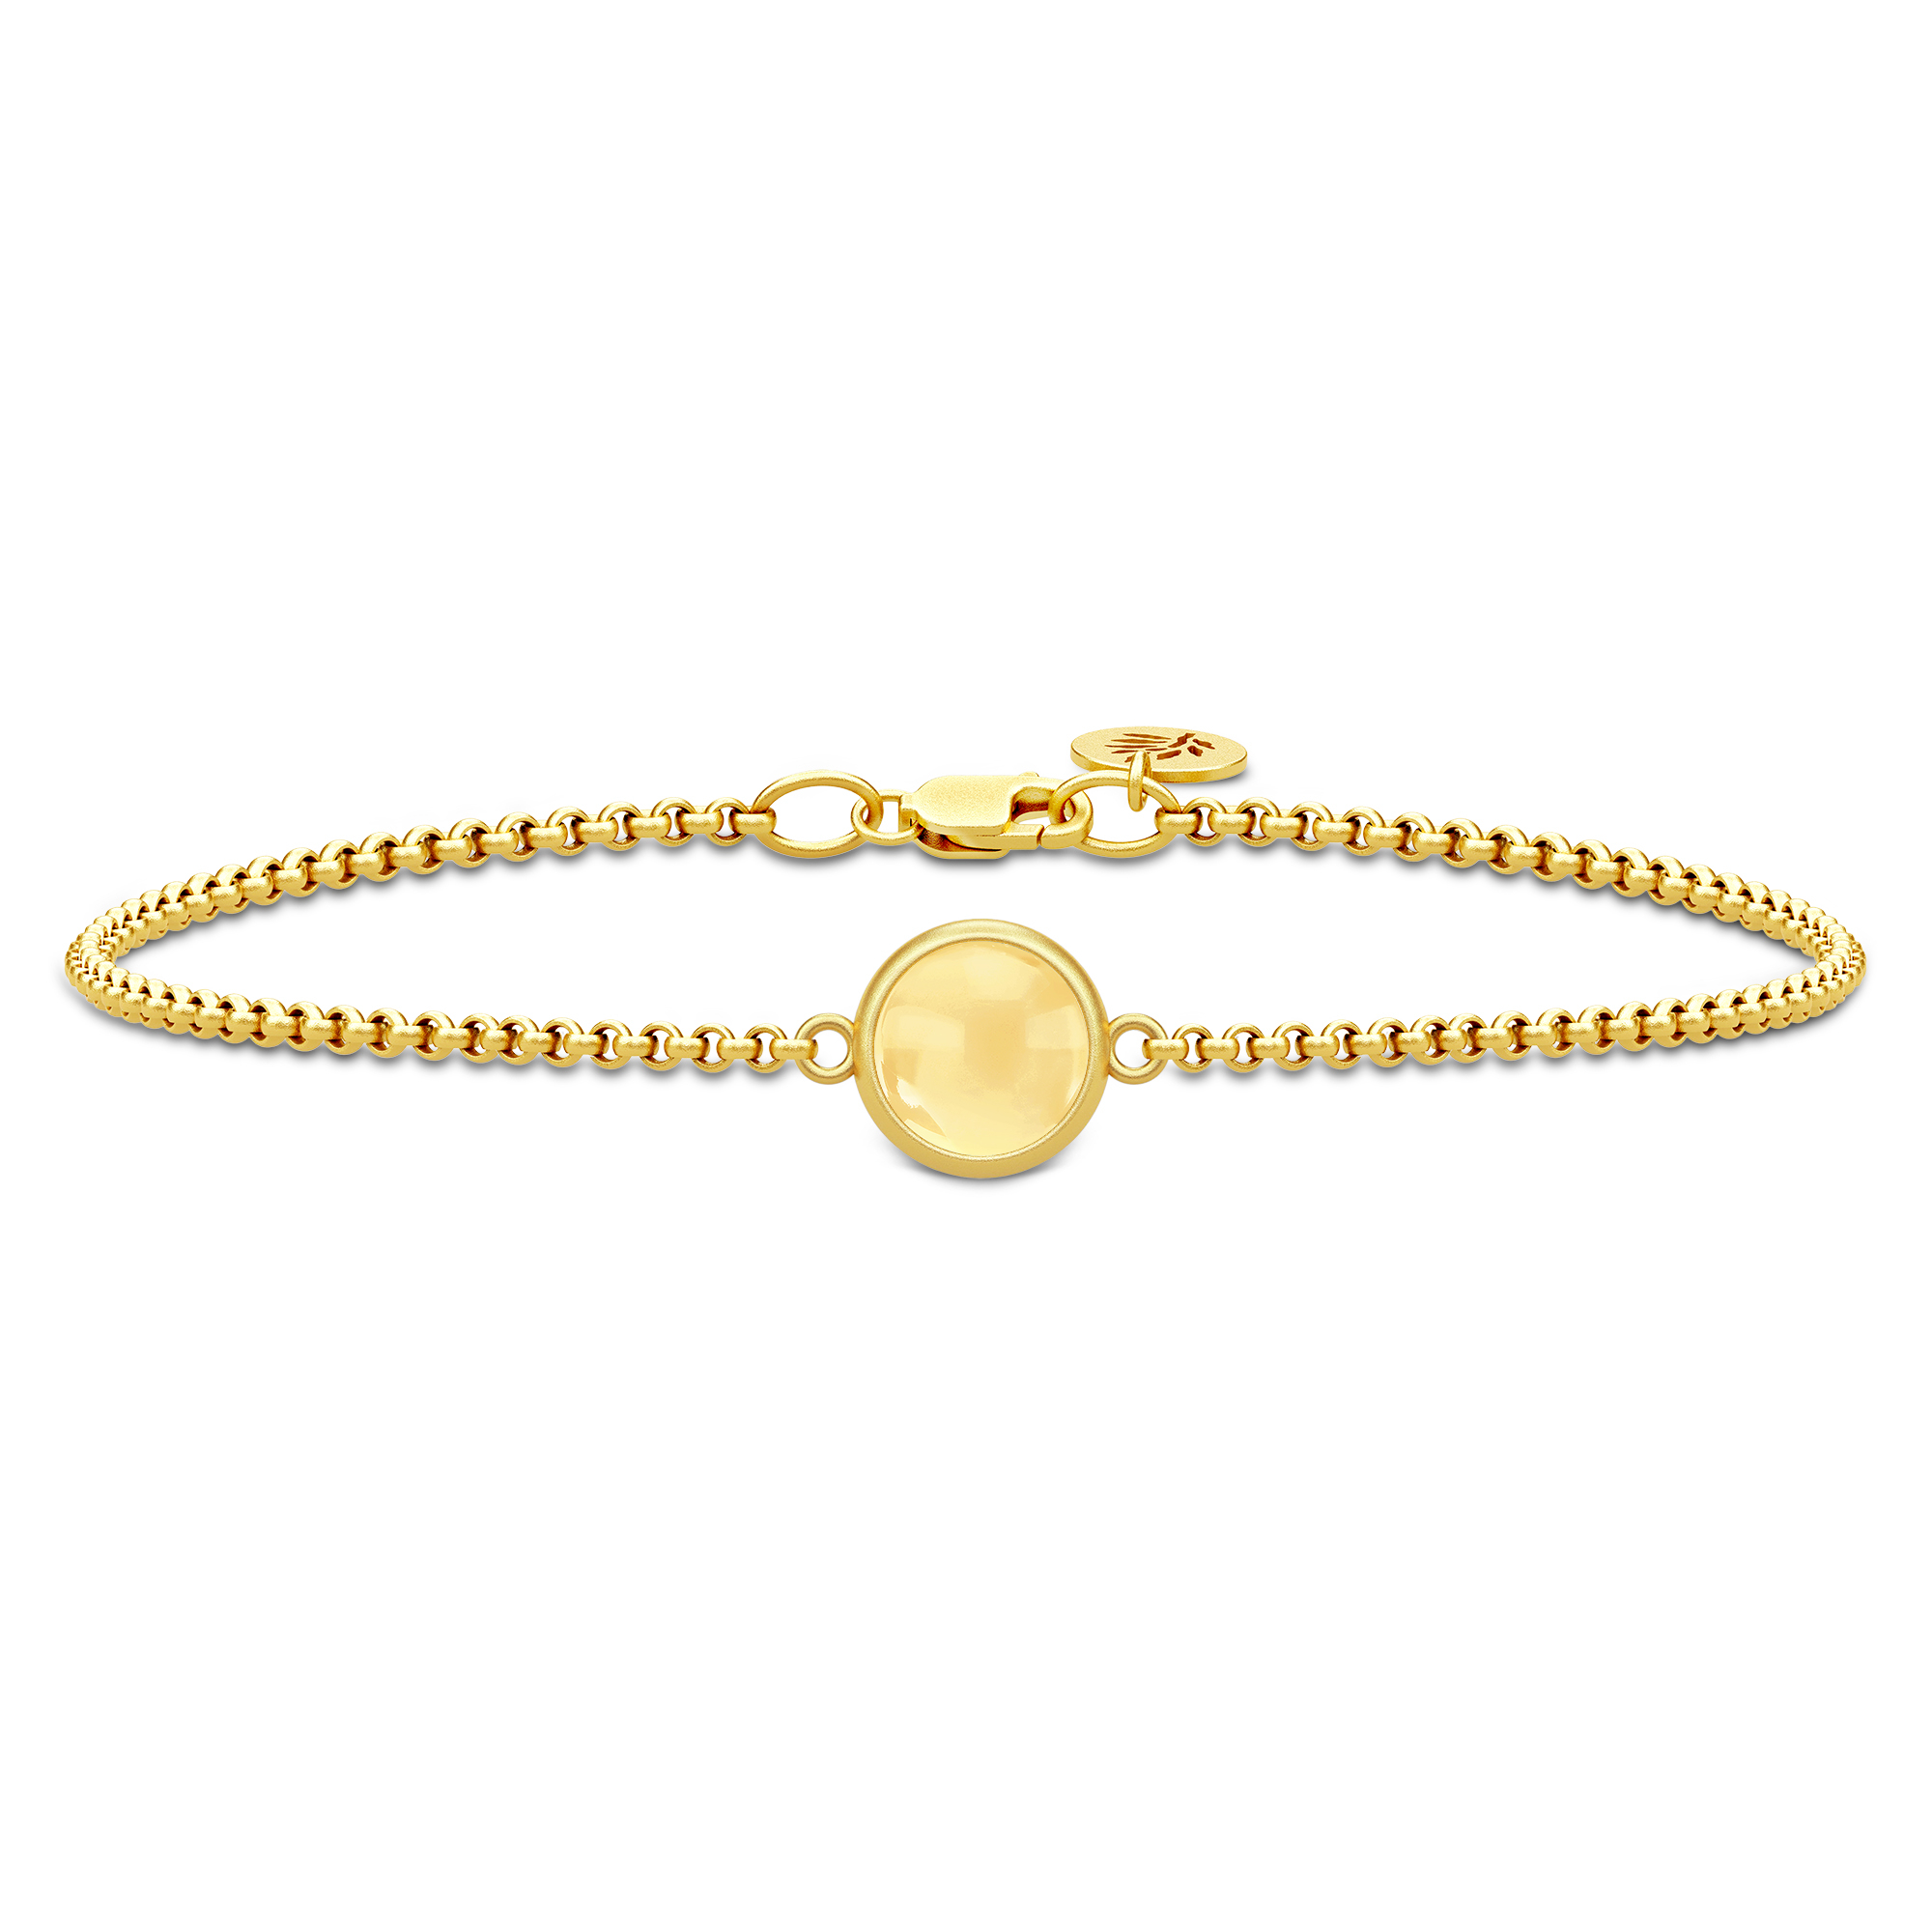 Julie Sandlau Primini armbånd i forgyldt med gul citrin krystal